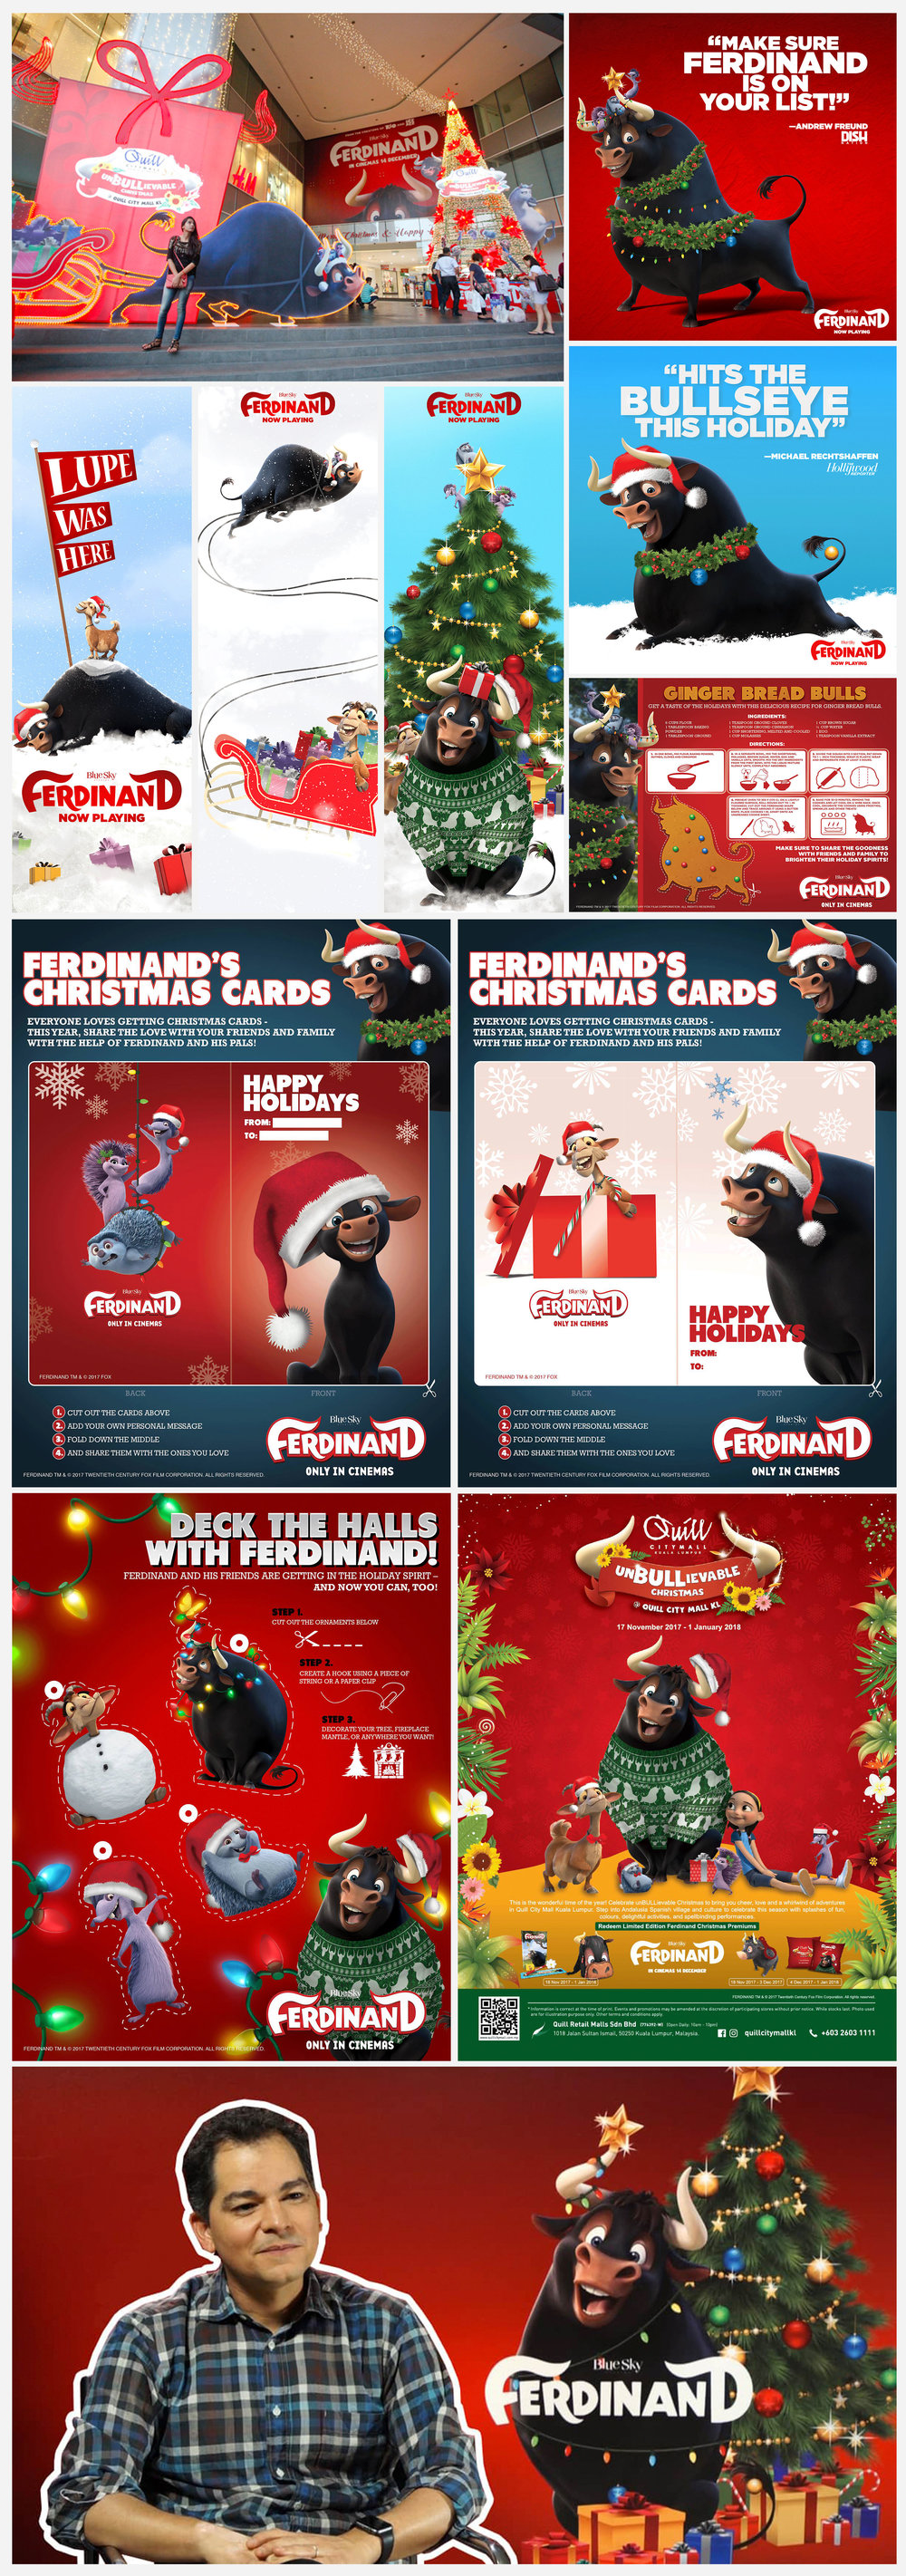 riselle-trinanes-ferdinand-christmas-styleguide-14.jpg